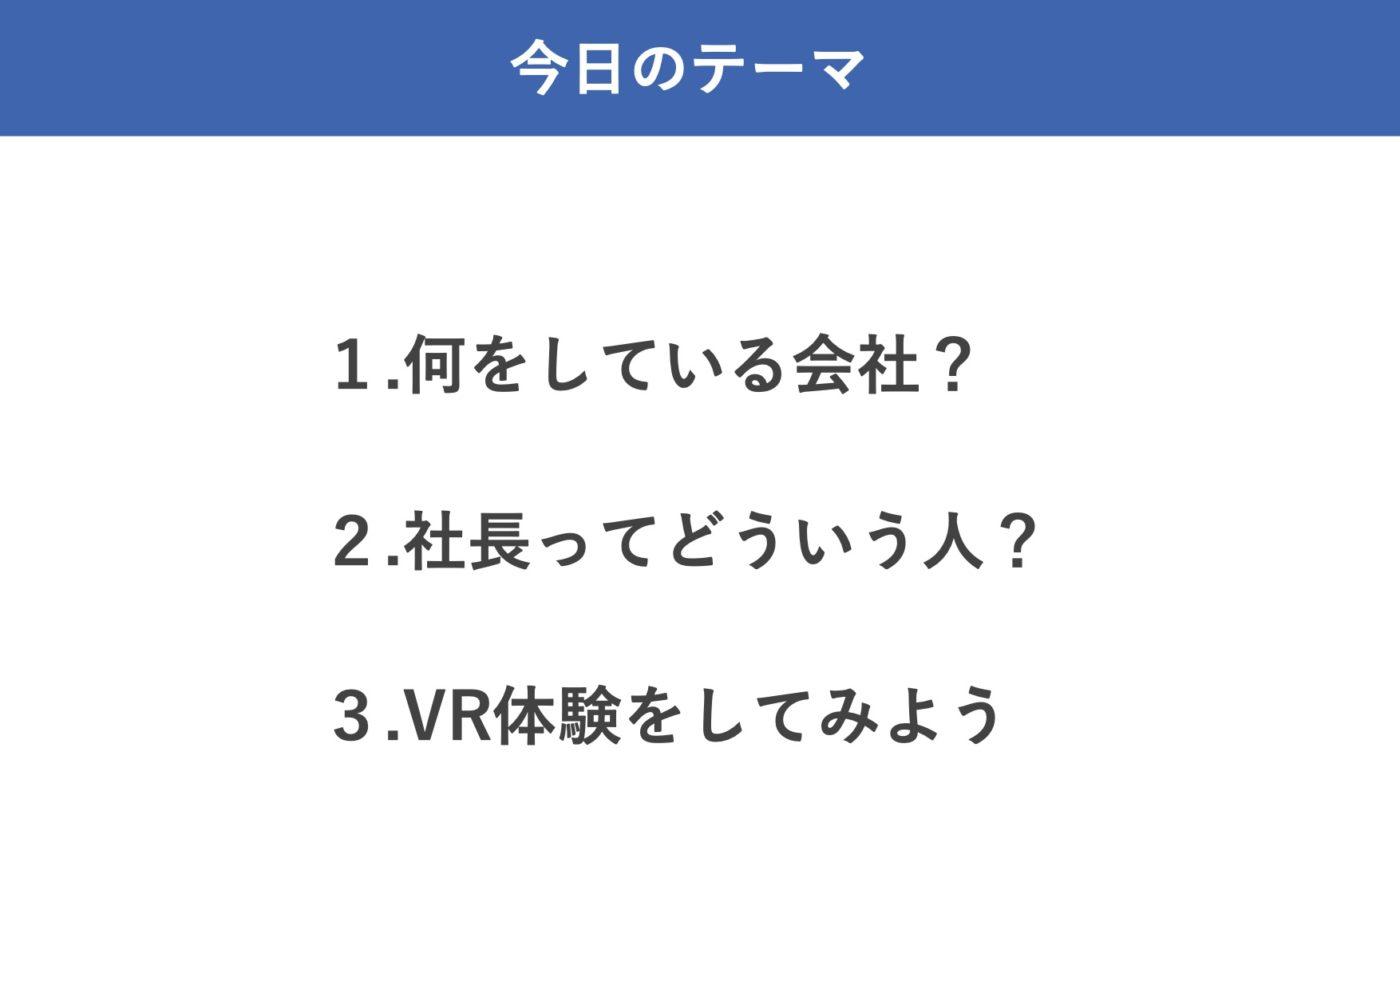 佐渡総合高校 授業テーマ